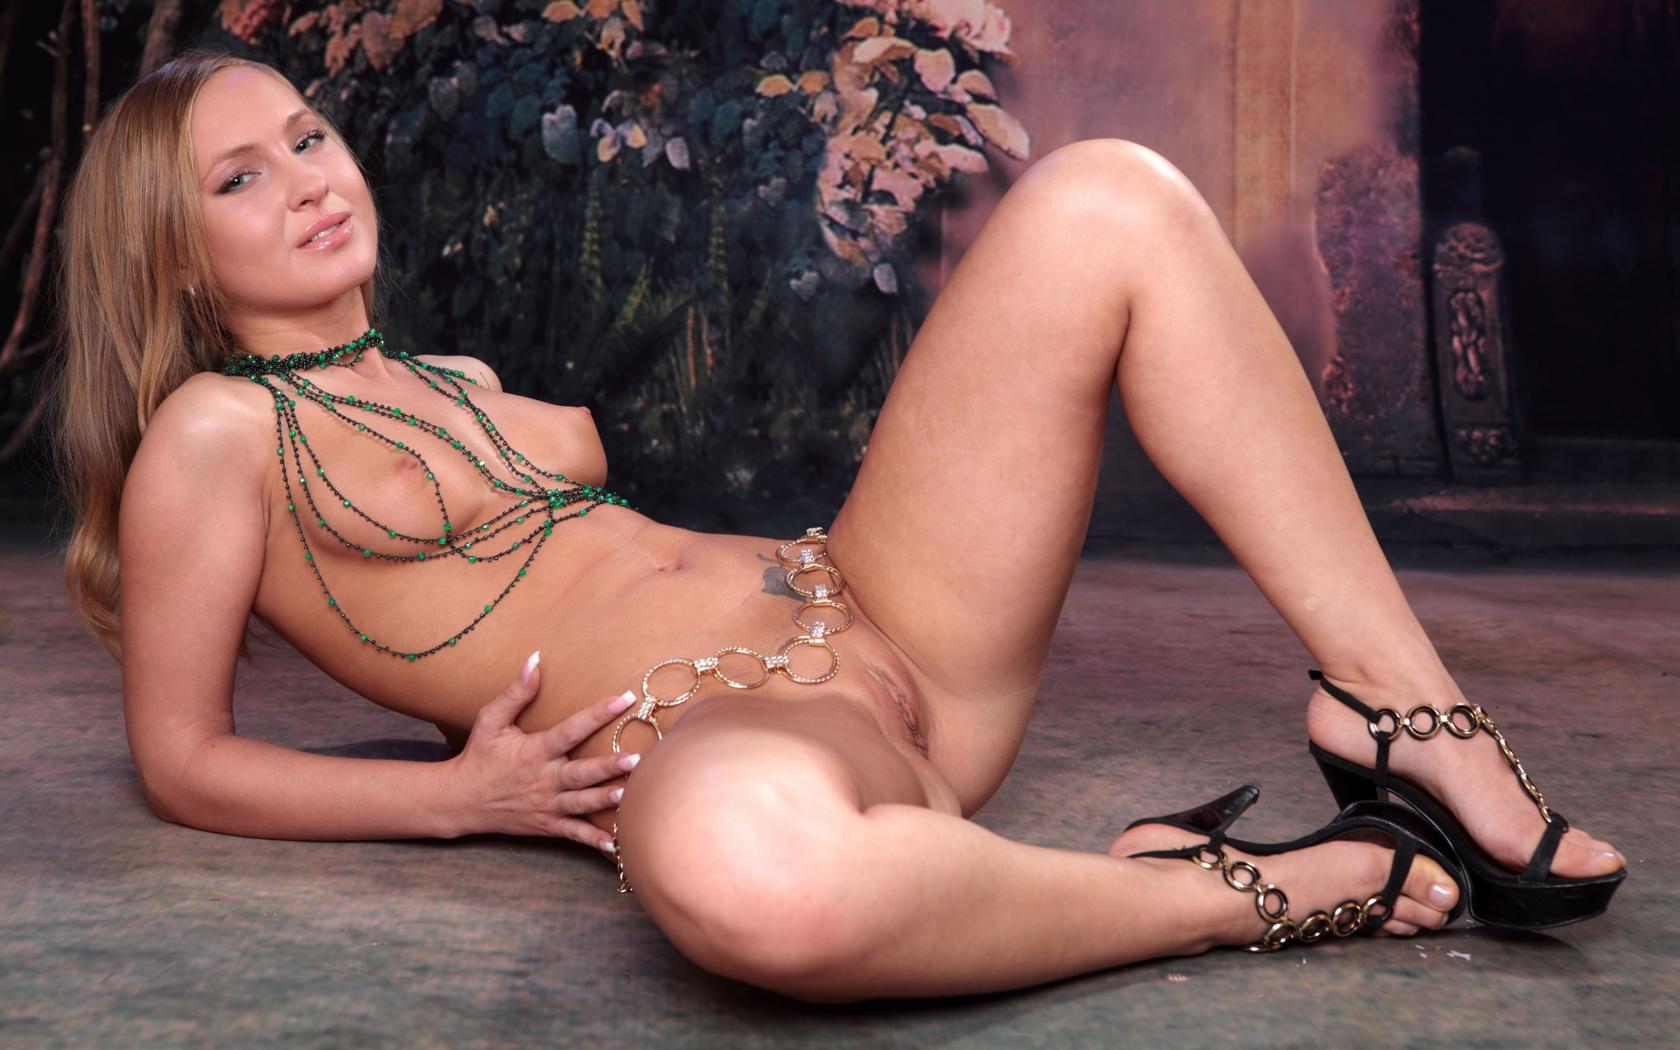 kristine reyes laked boobs photo